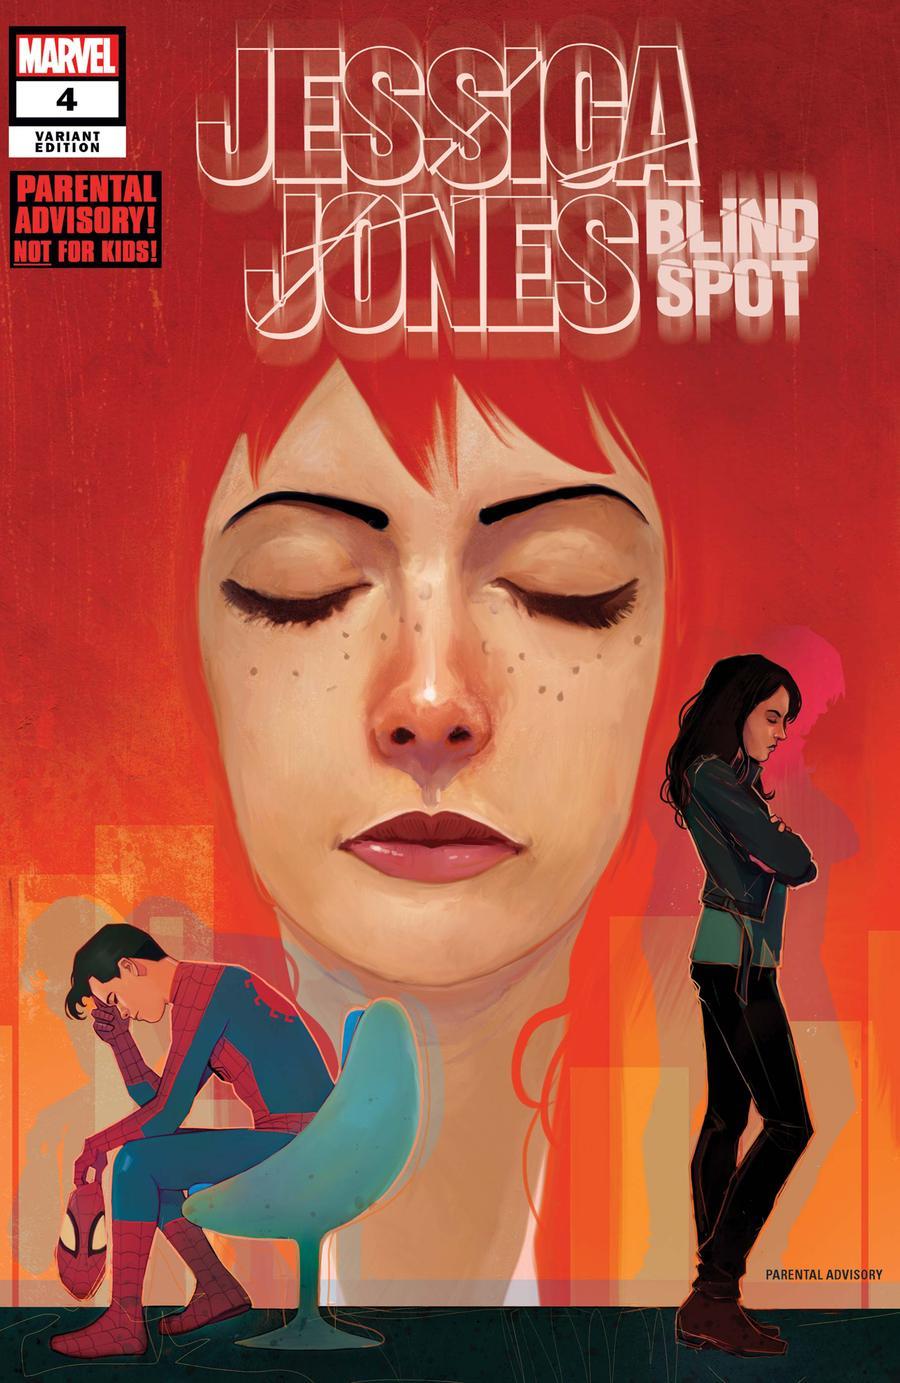 Jessica Jones Blind Spot #4 Cover B Variant Martin Simmonds Cover